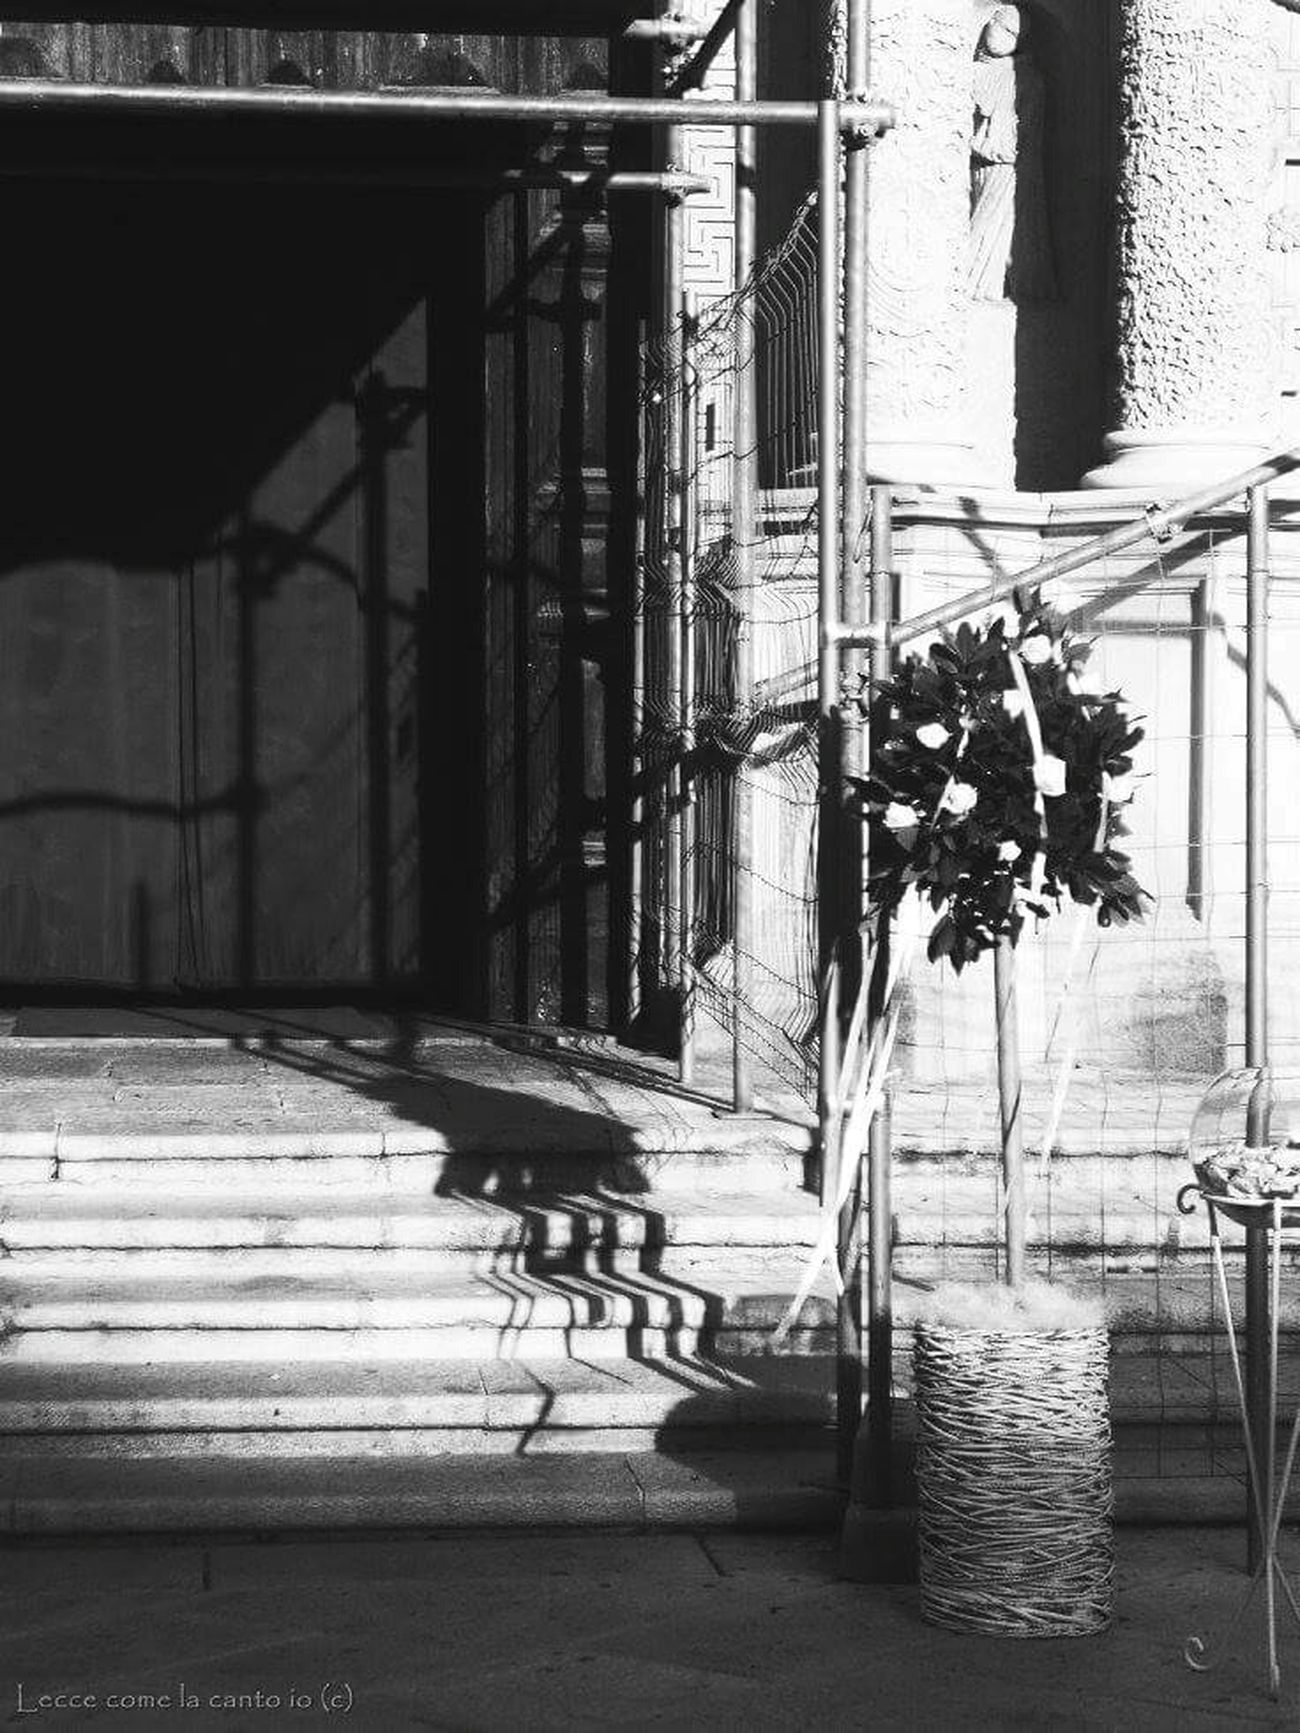 More on https://www.facebook.com/leccecomelacantoio/ Lecce Lecce - Italia Leccecomelacantoio Blackandwhite Photography Bnw Church Wedding Wedding Photography Wind Black And White Photography